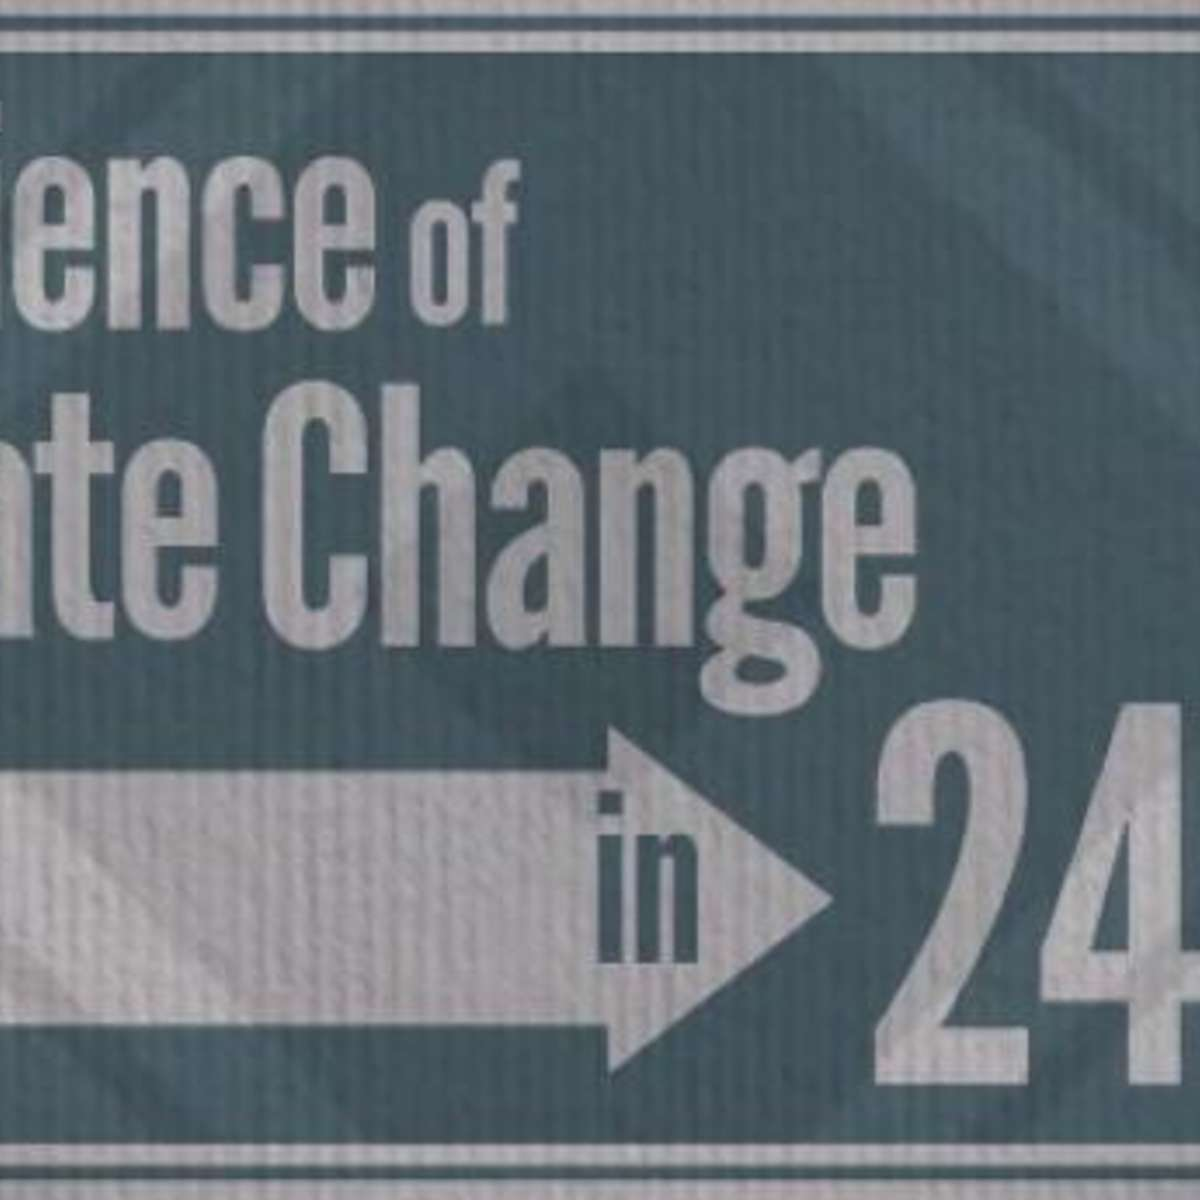 itsoktobesmart_climatechange.jpg.CROP.rectangle-large.jpg